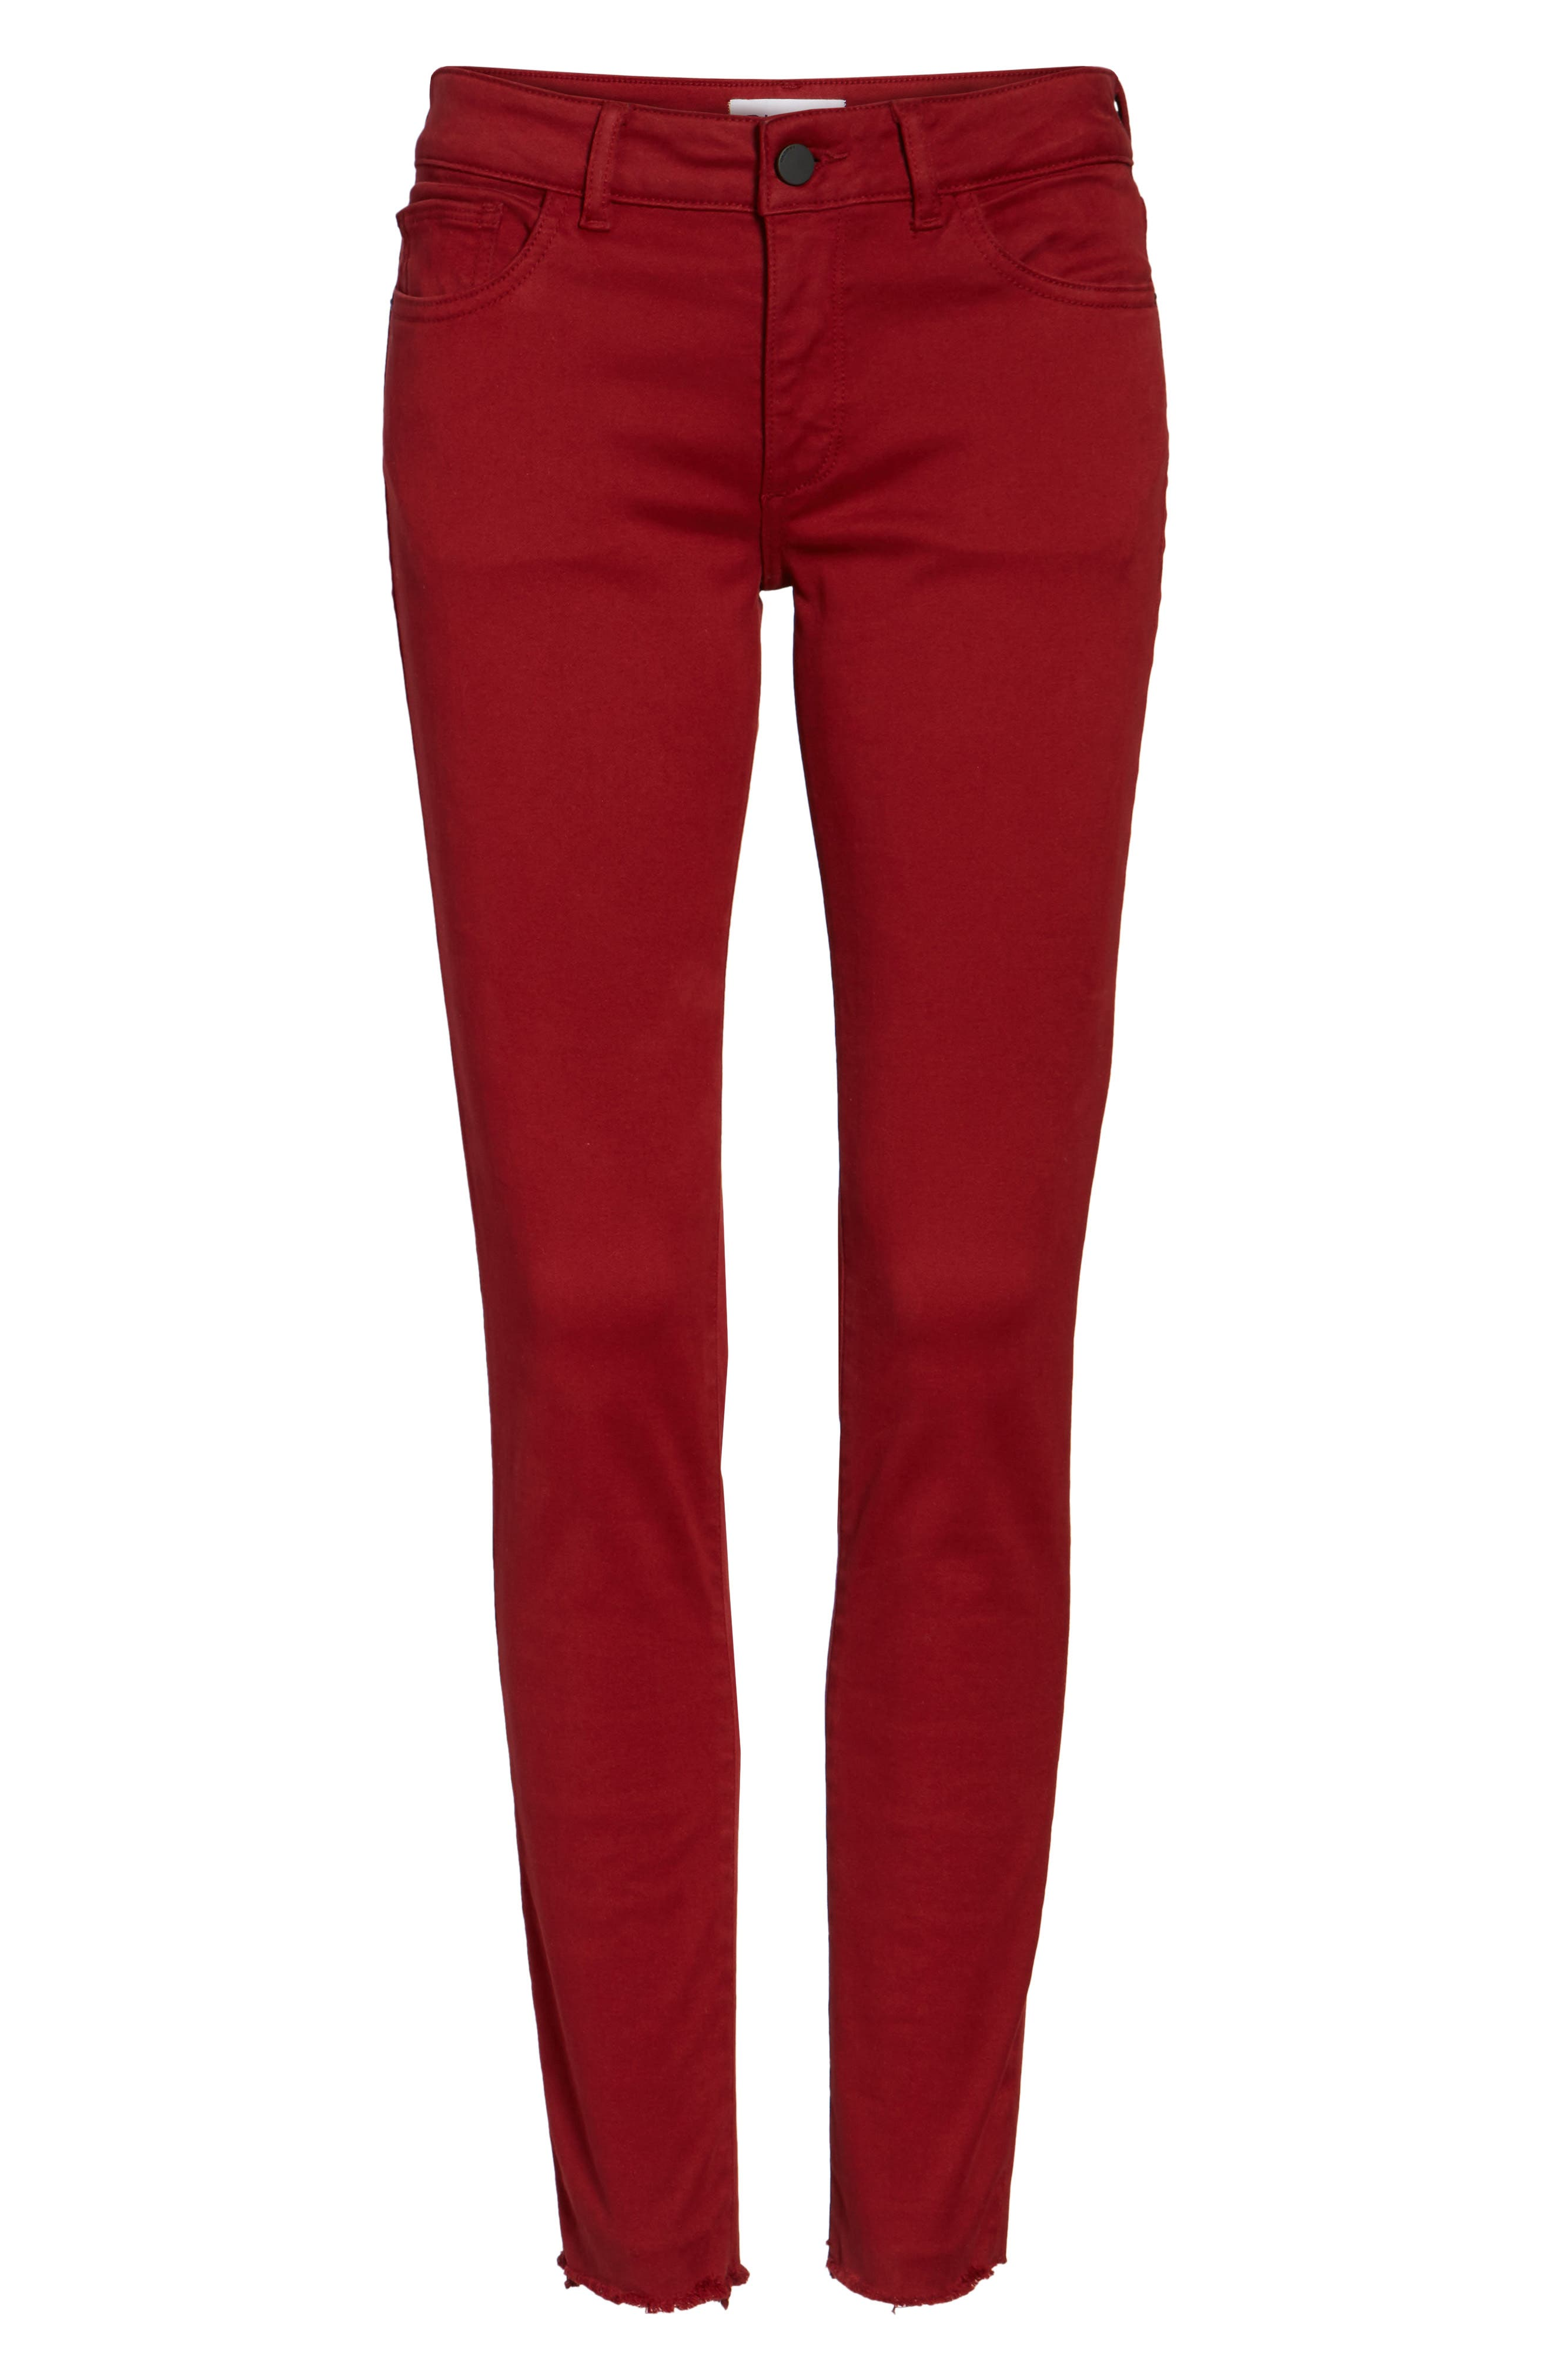 Emma Power Legging Jeans,                             Alternate thumbnail 6, color,                             Rhubarb